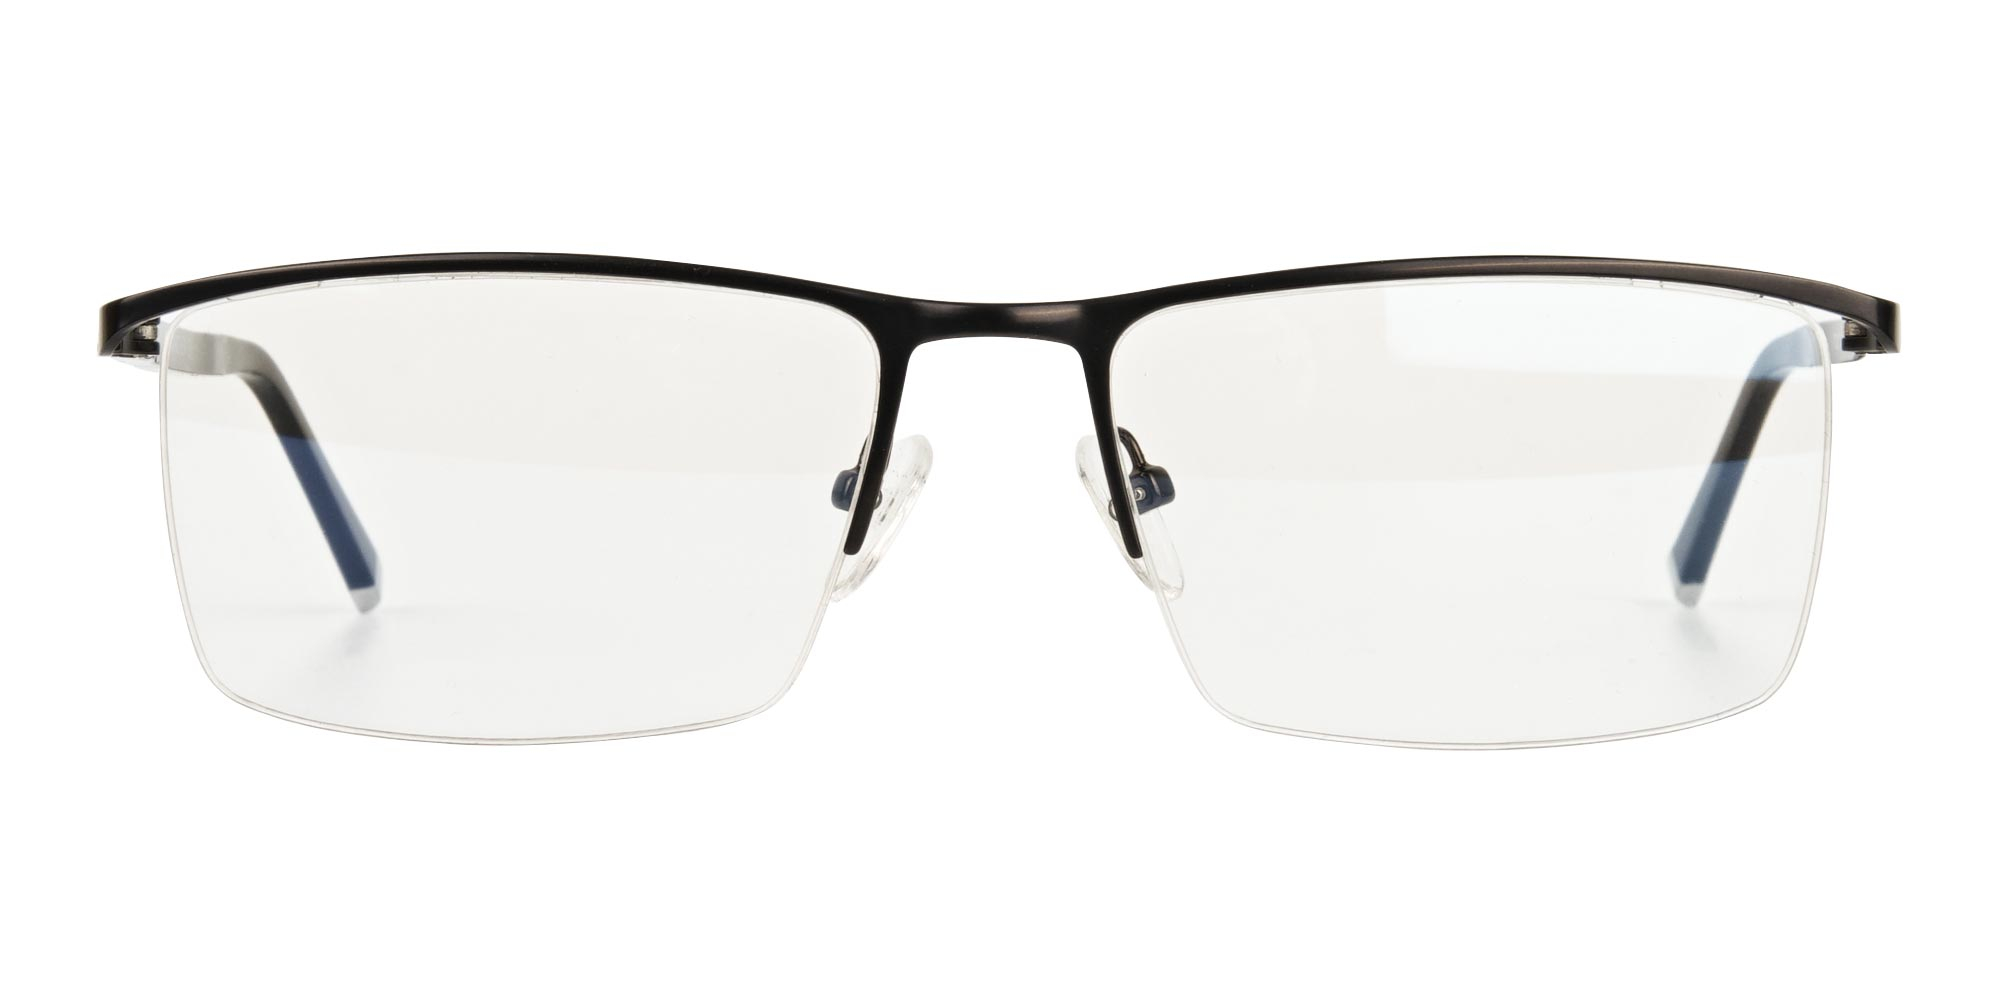 Black Semi-Rimless Glasses for oval face shape